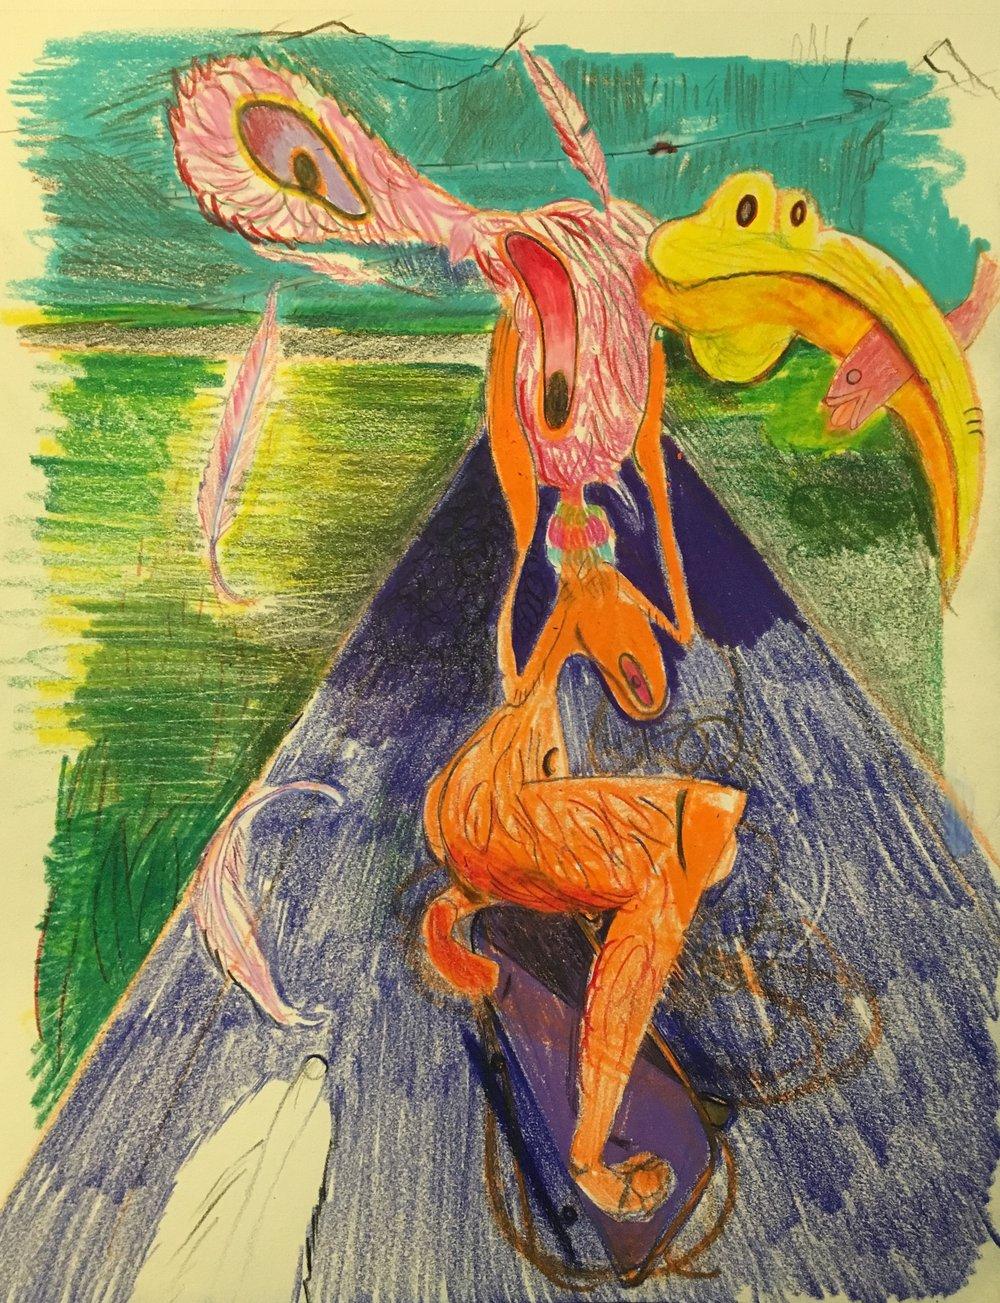 3.Orange Bird, 2018, color pencil on paper, 11 x 14 in.jpg